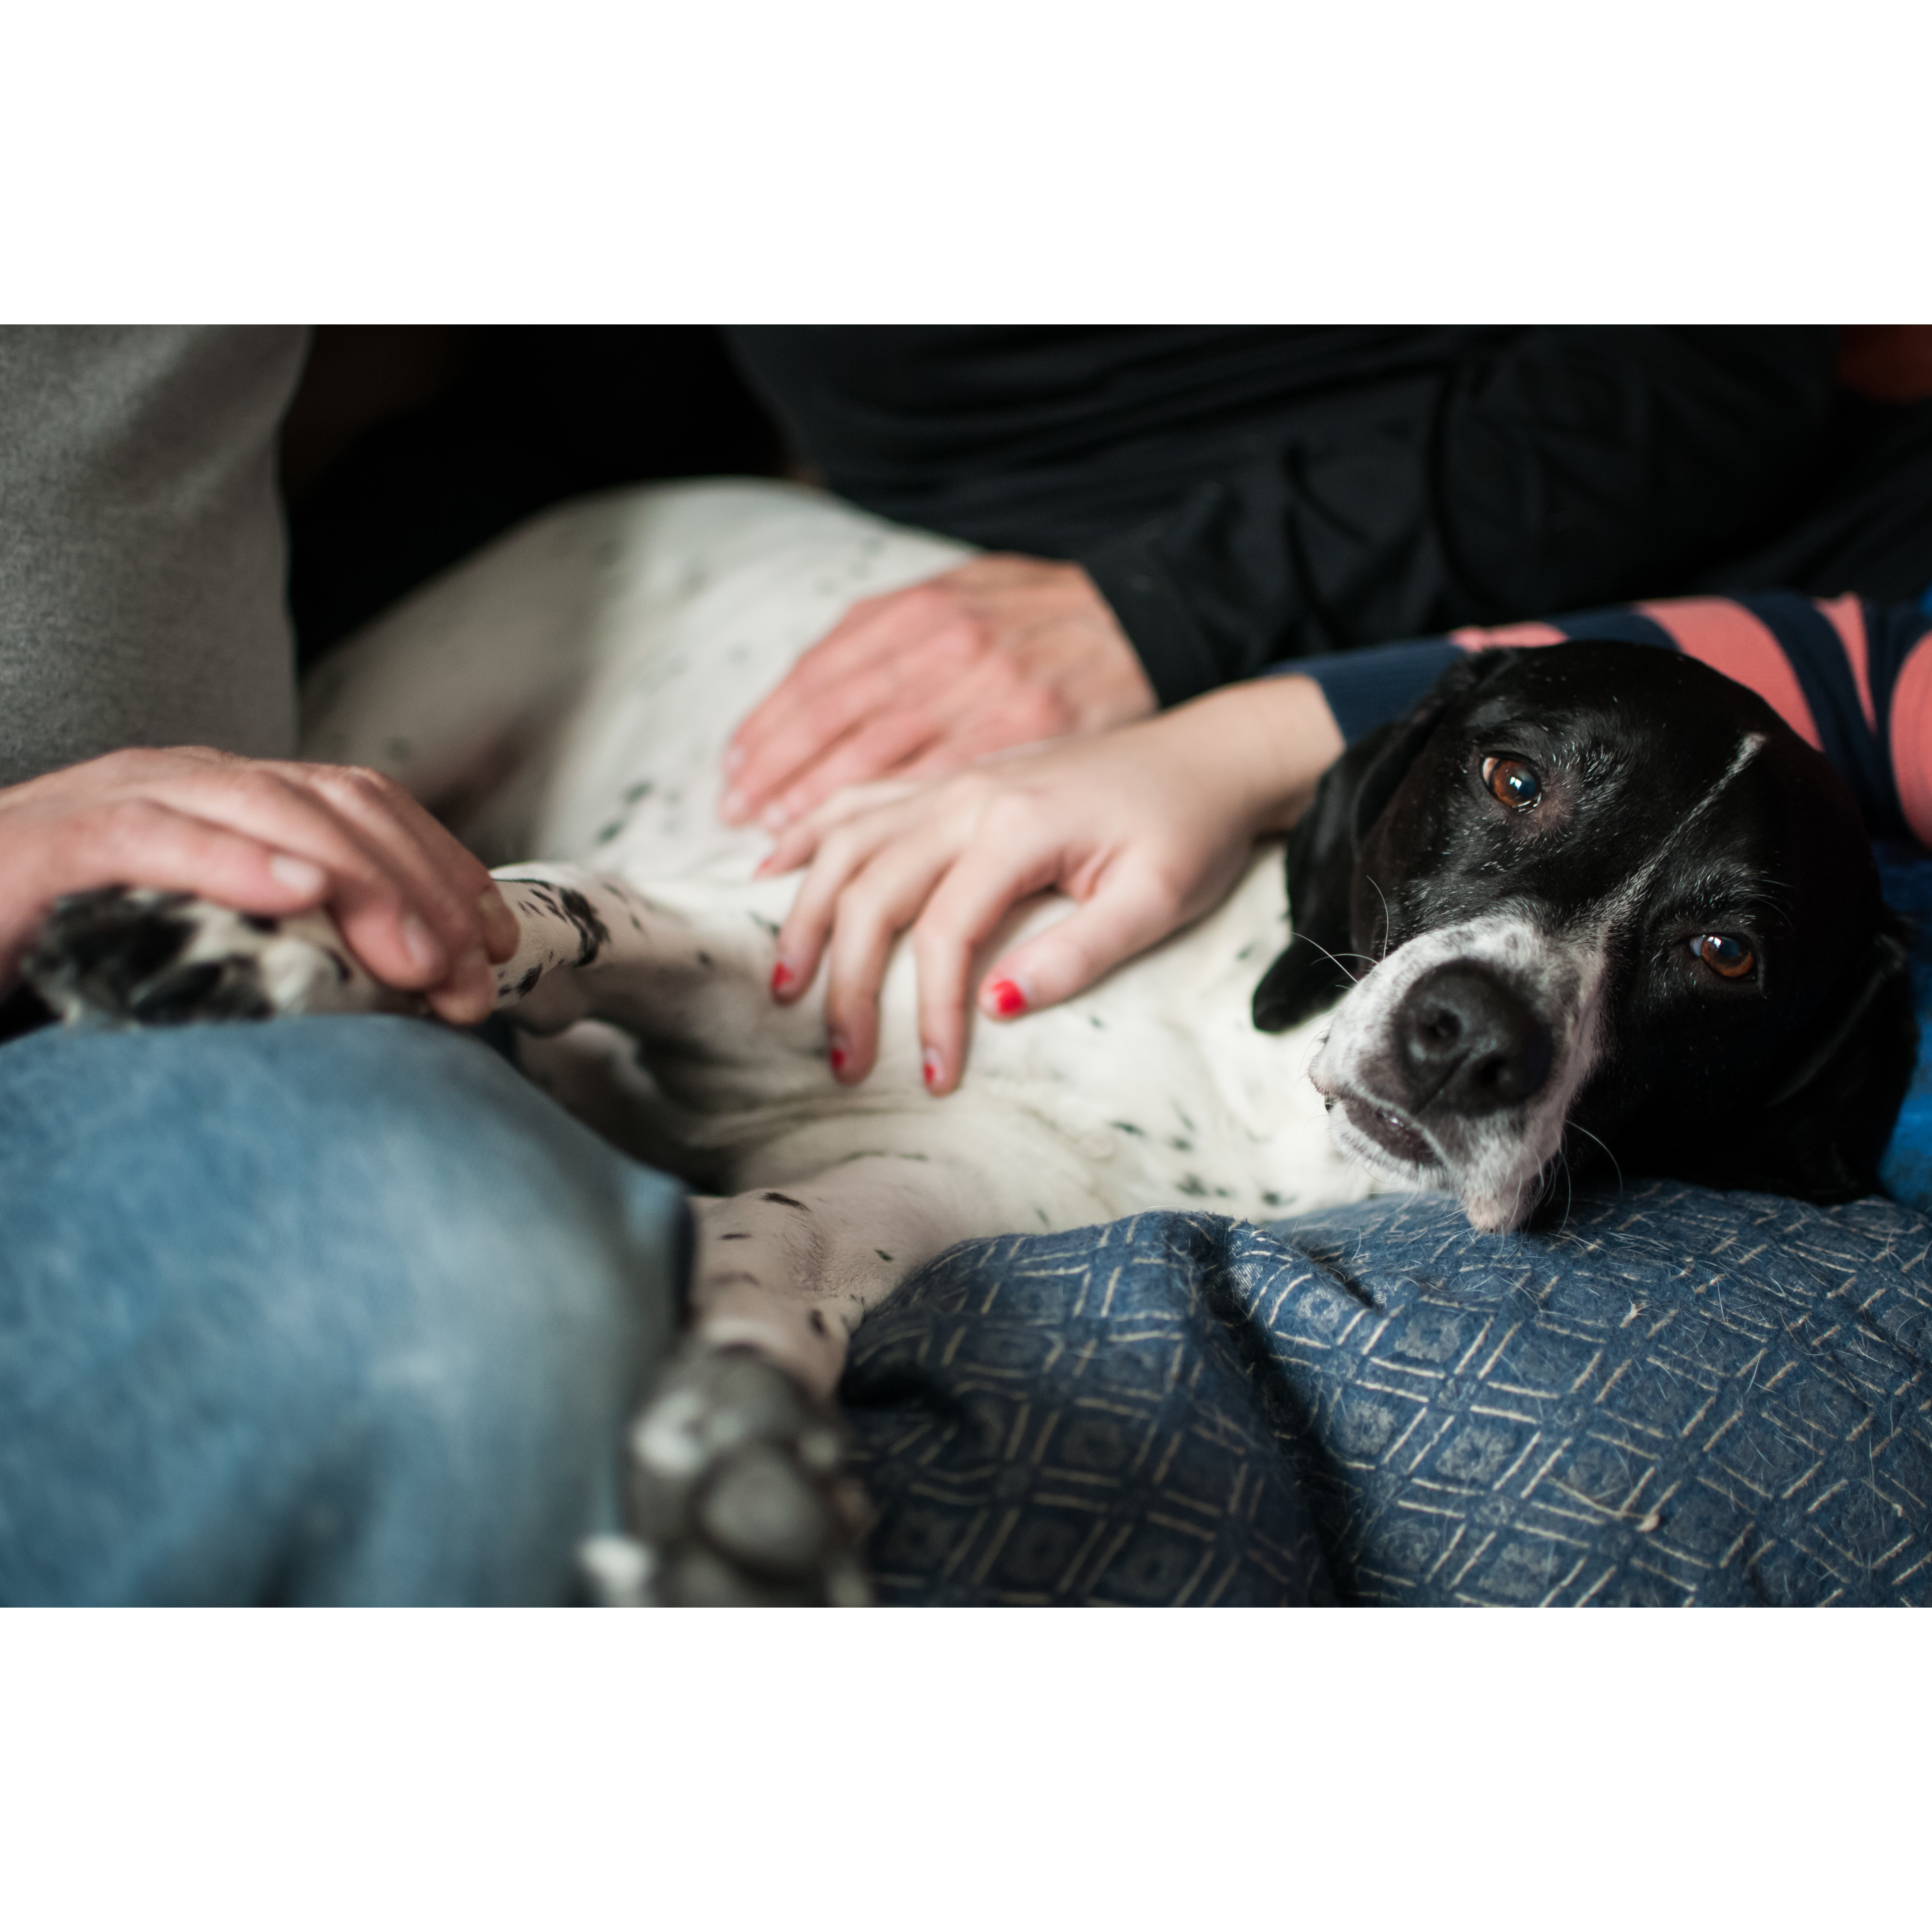 Creature Comforts Mobile Veterinary Service